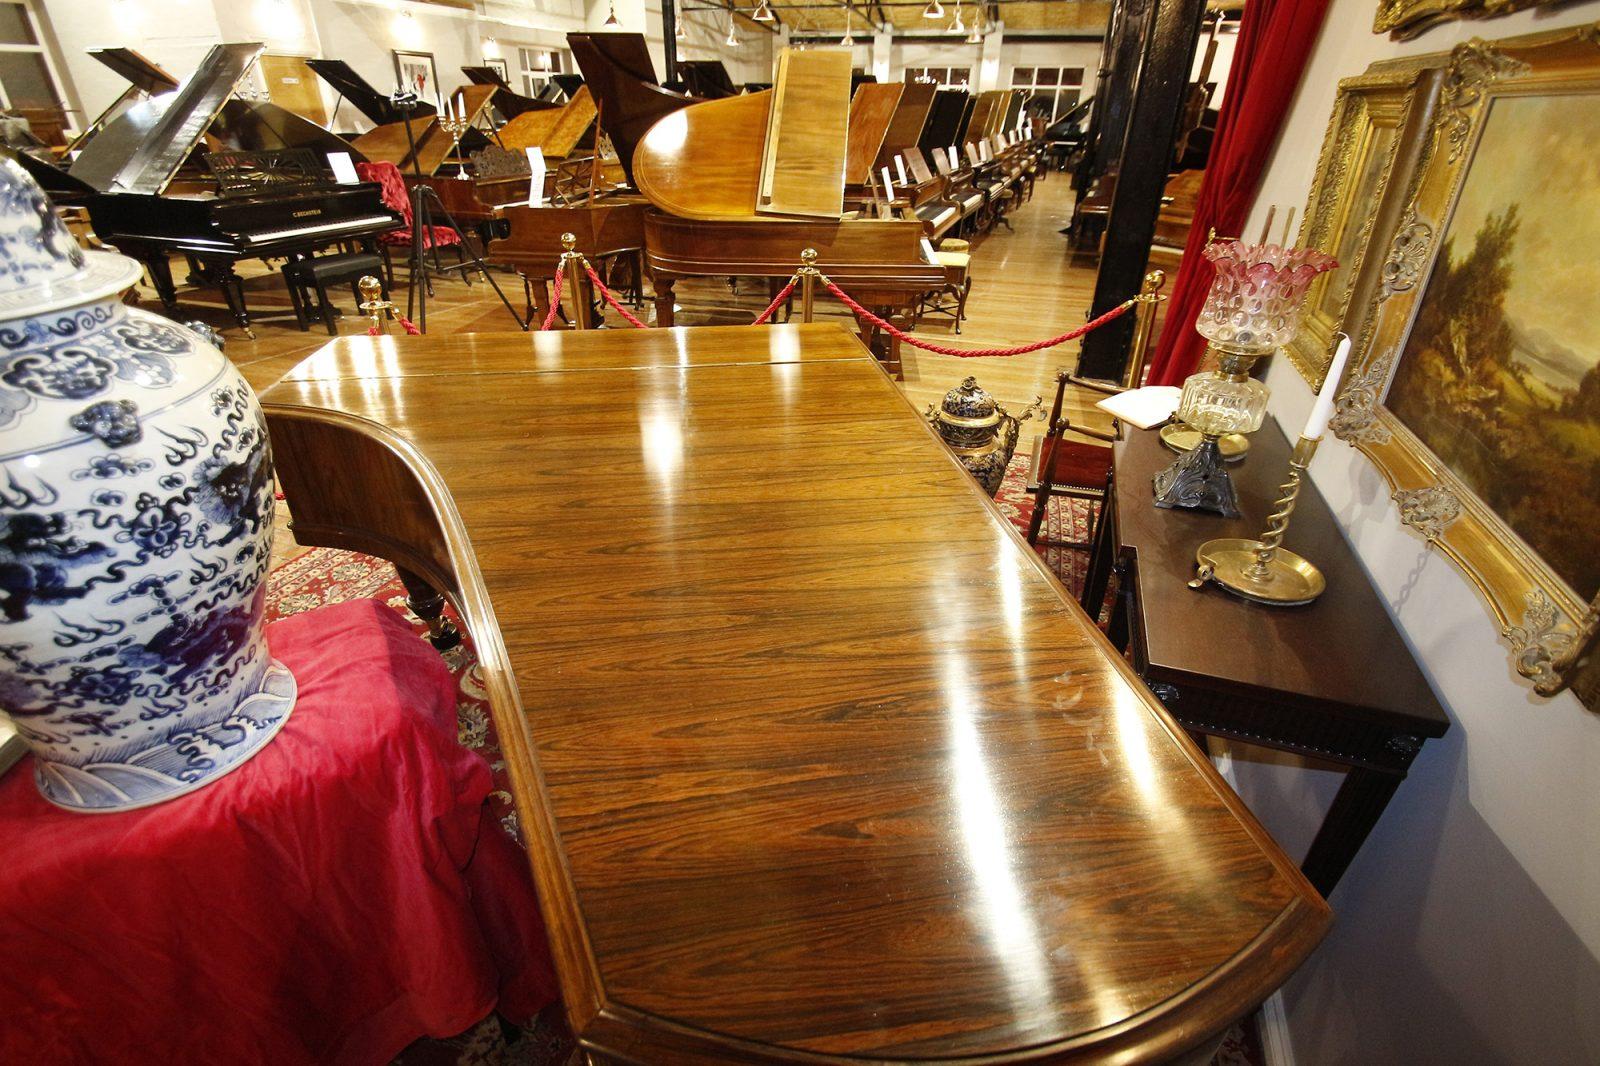 Queen Victoria John Broadwood Grand Piano - Sherwood Phoenix